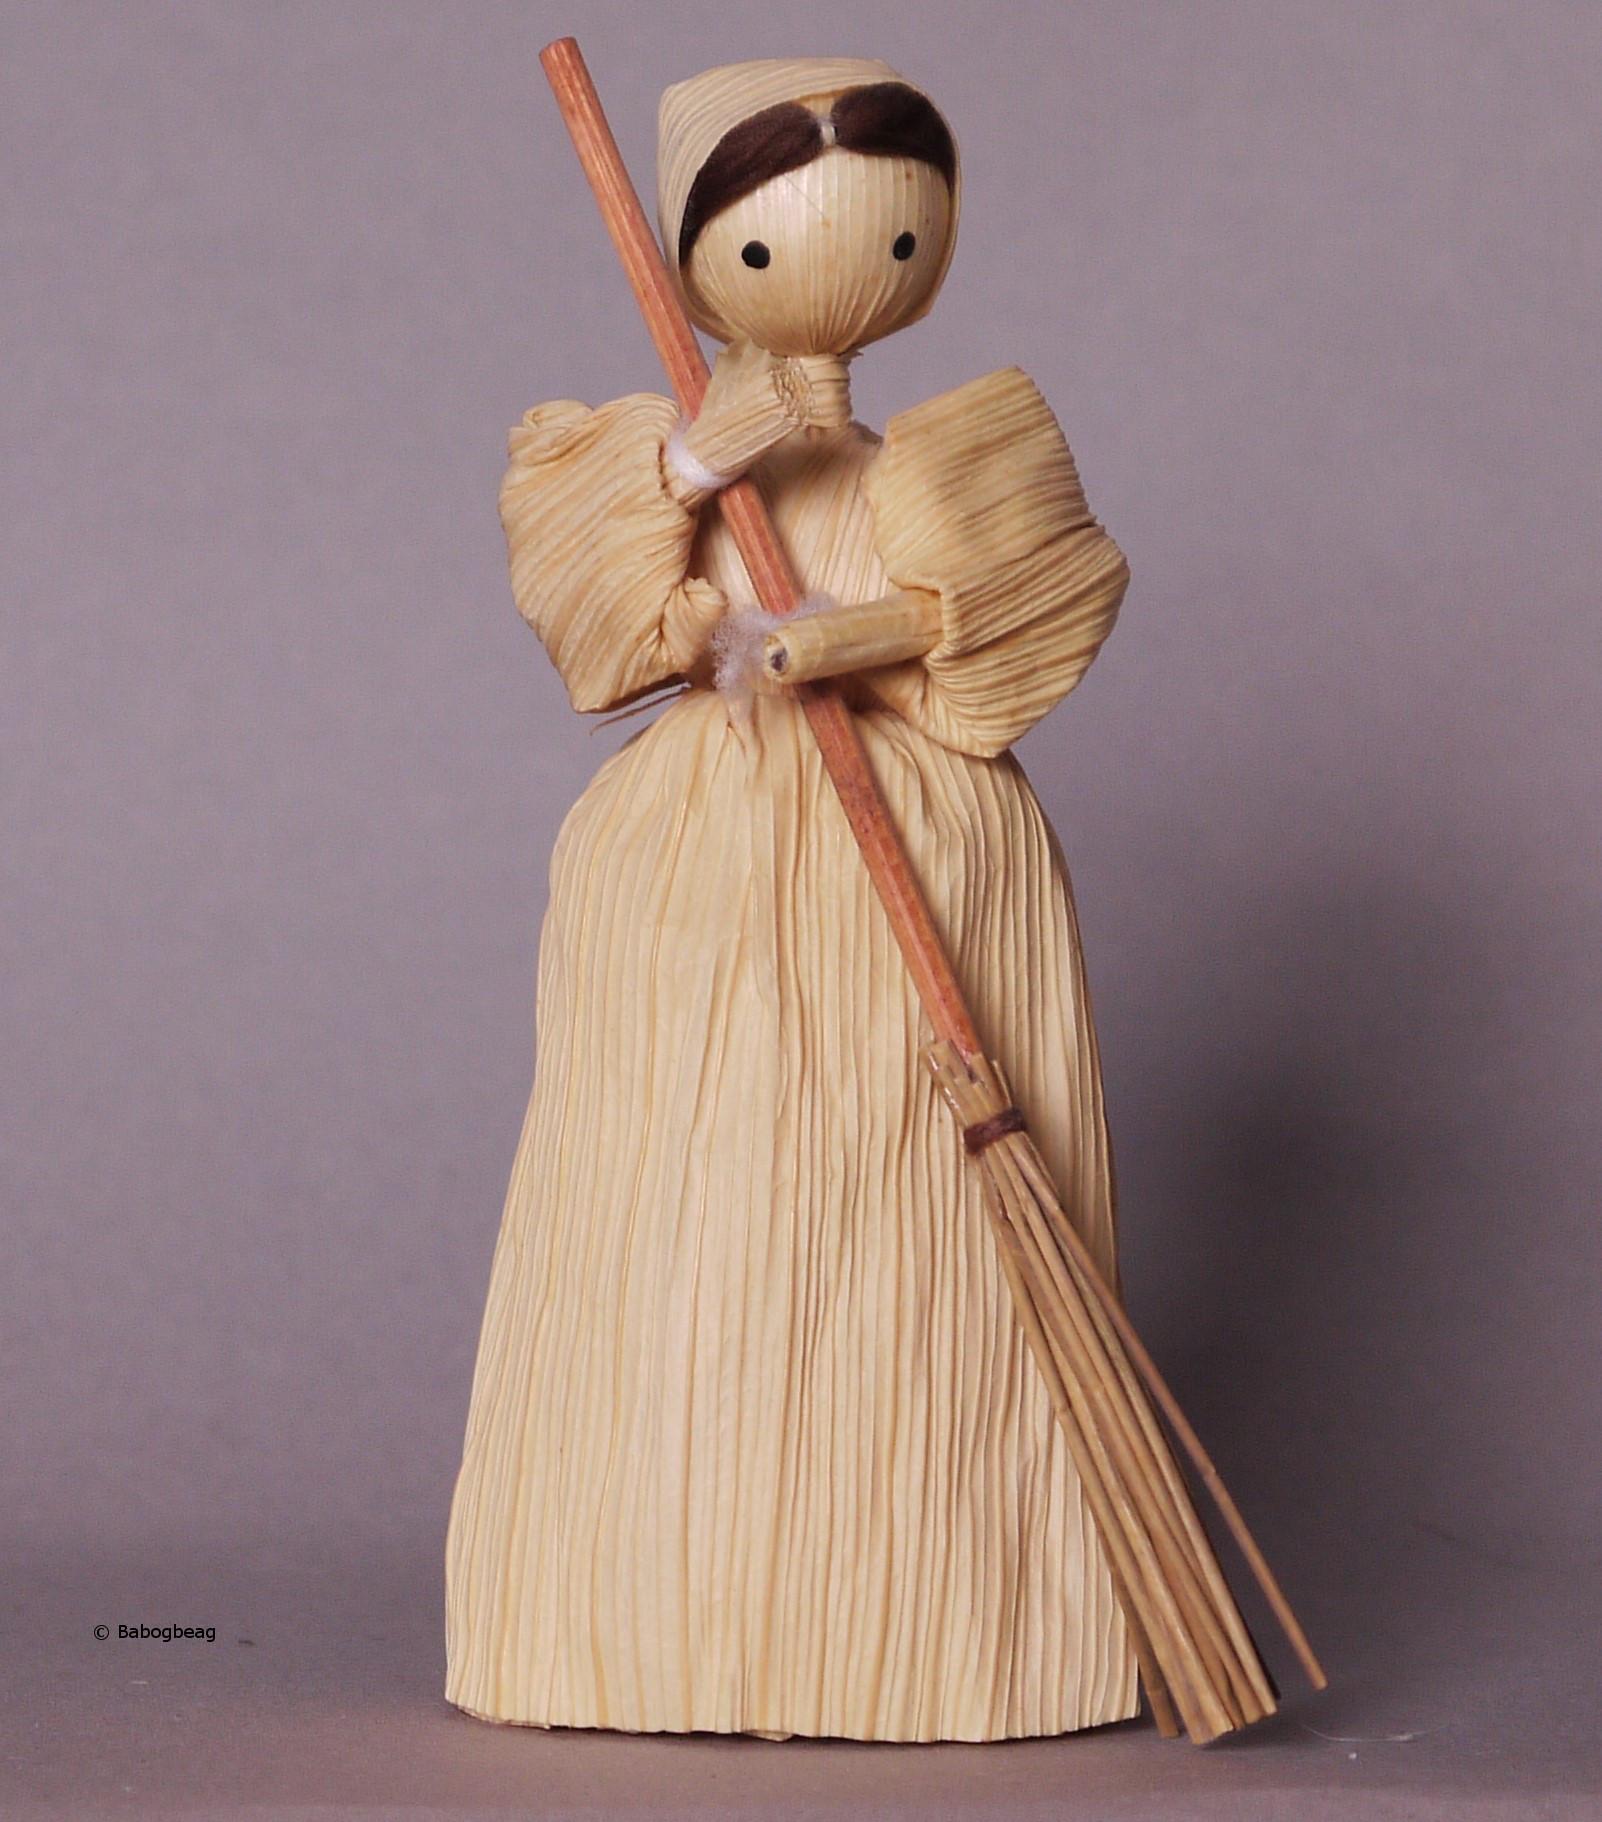 Slovakia Corn Husk Doll National Costume Dolls